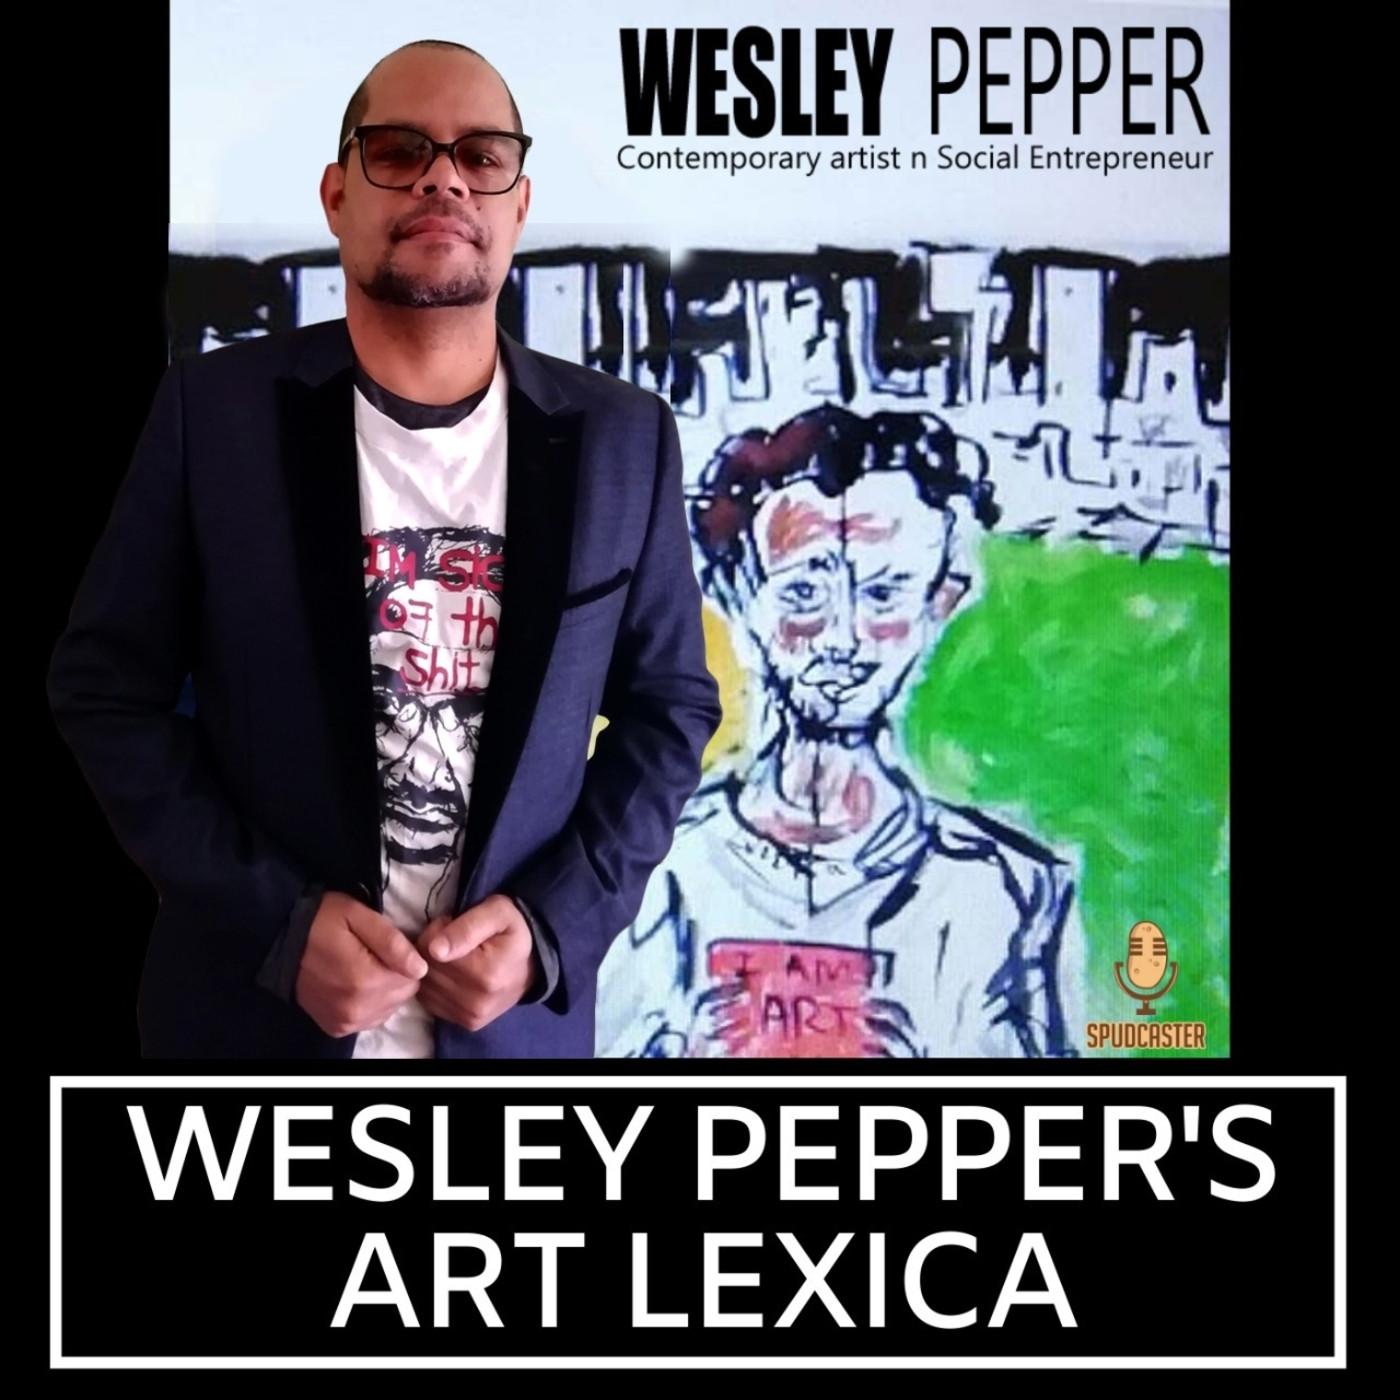 Wesley Pepper's Art Lexica: A Conversation With Matete Motsoaledi